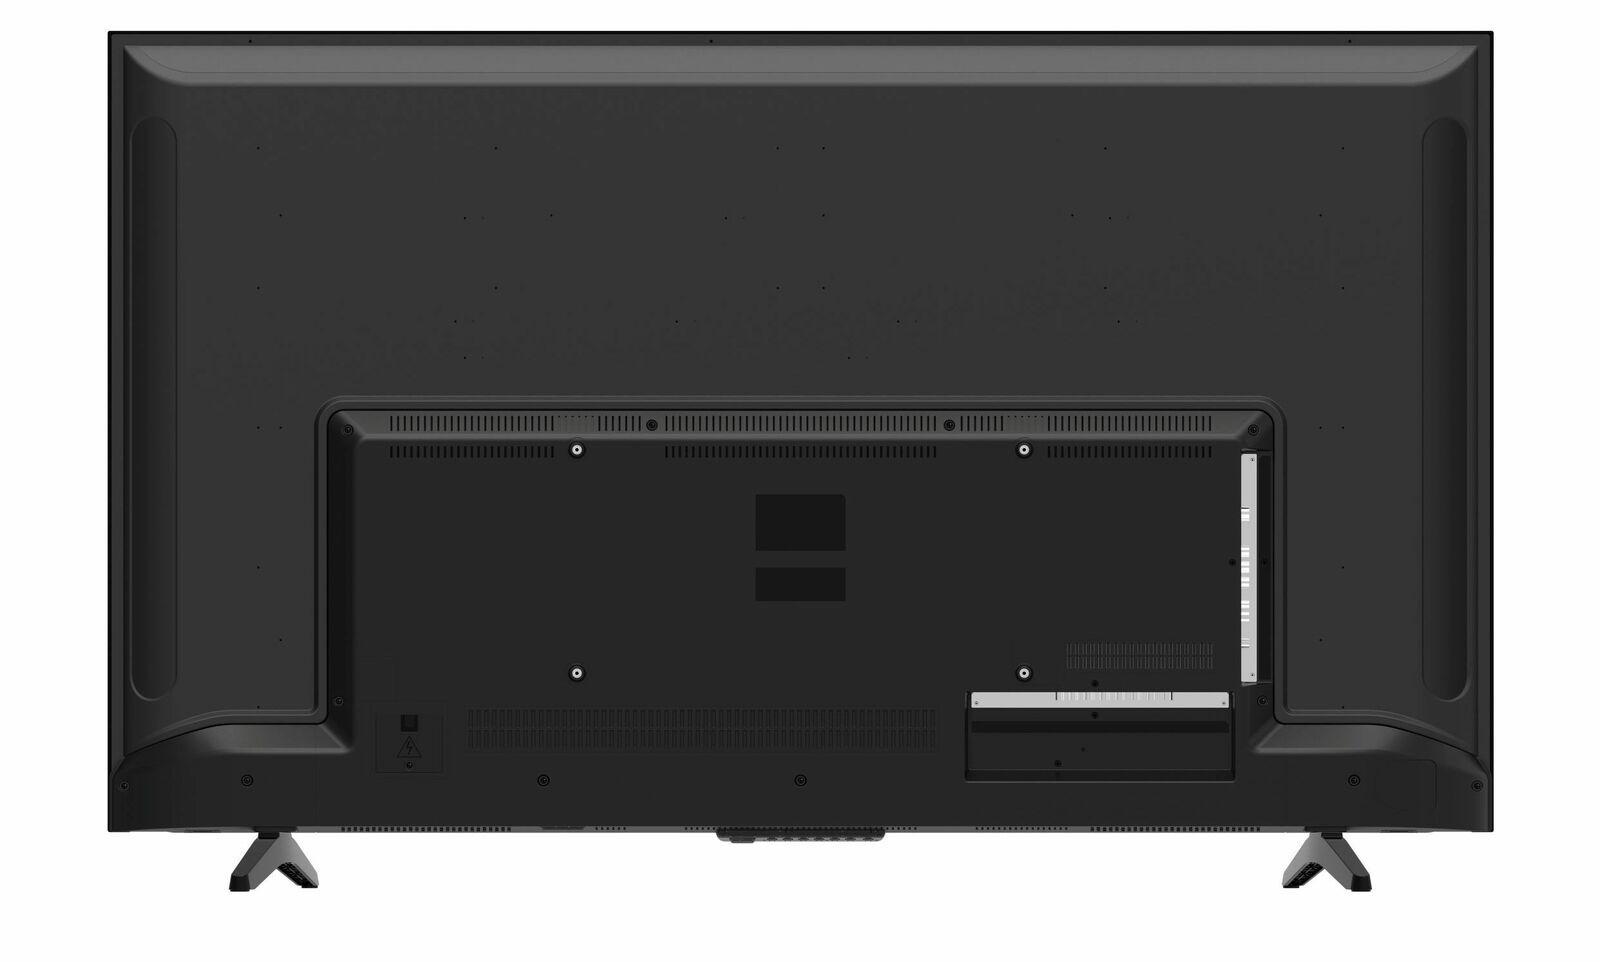 "RCA VIRTUOSO 55"" Class 4K Ultra HD (2160P) Smart LED TV (RNSMU5536) image 5"